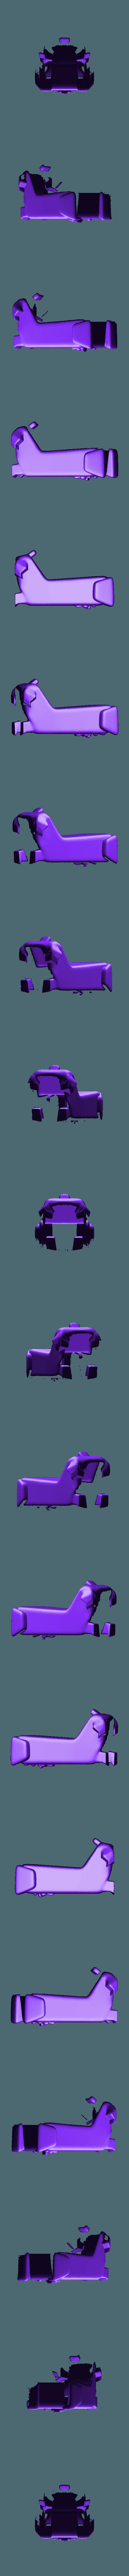 DOGGYsitting_red1.stl Download free STL file Un cane (a dog) seduto • 3D printing model, thePixelsChips